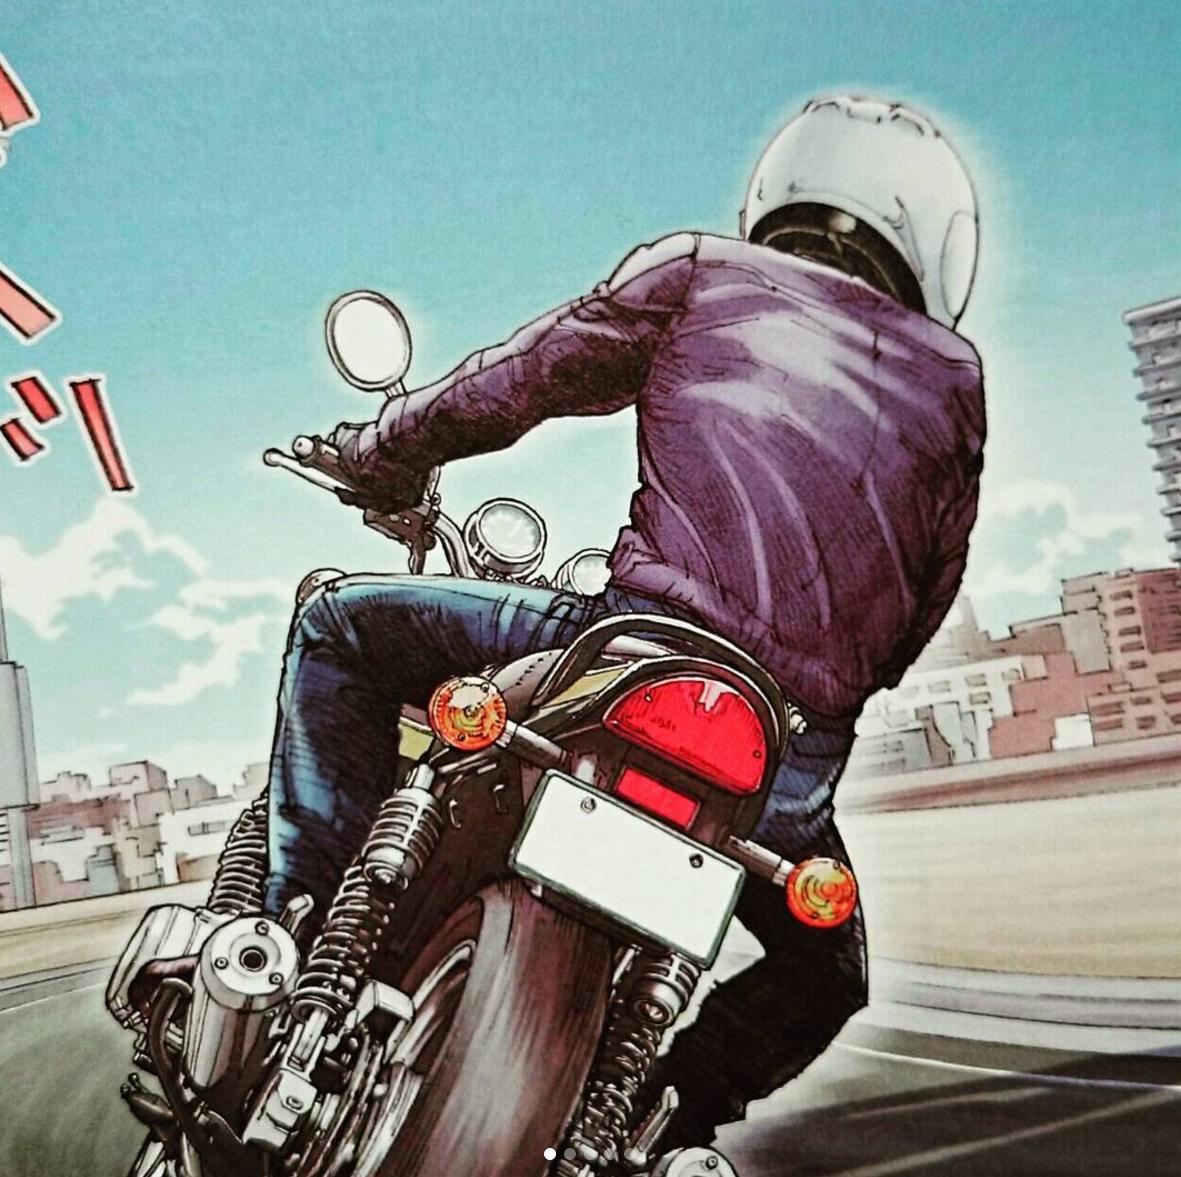 Badass Motorcycle Art By Zx 12rf